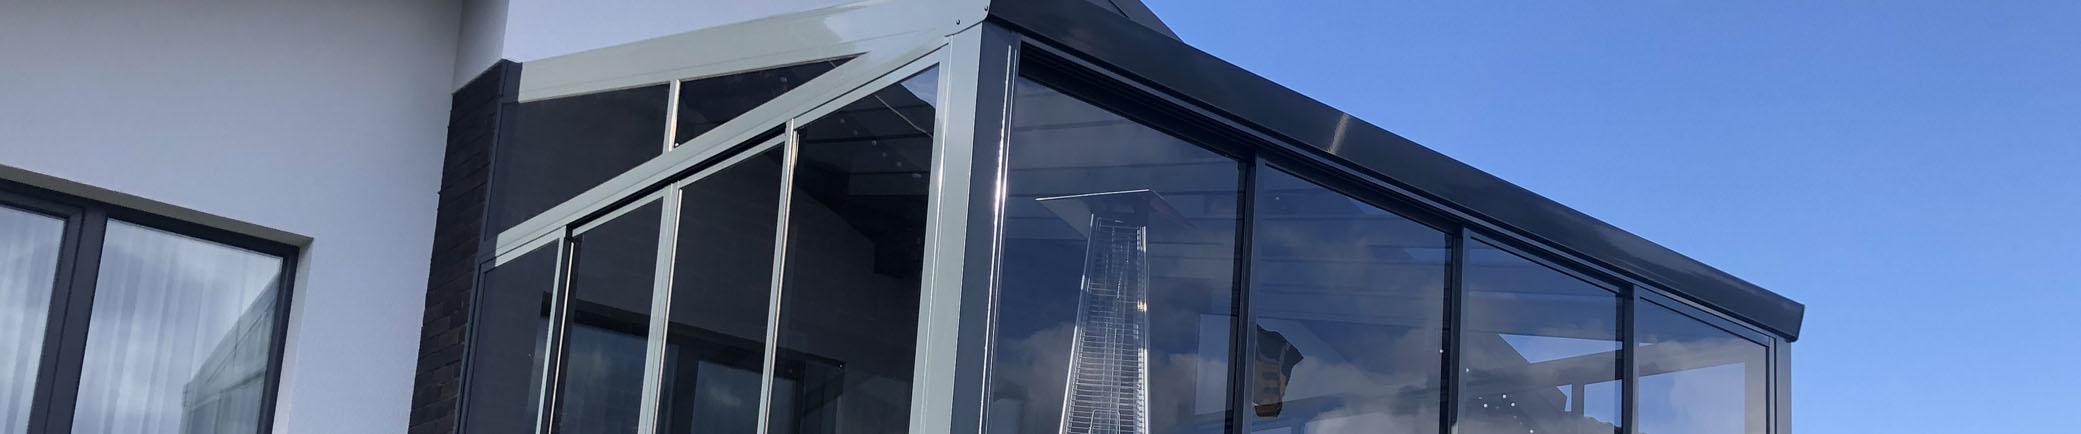 stiklo baliustrados sistemos esesx